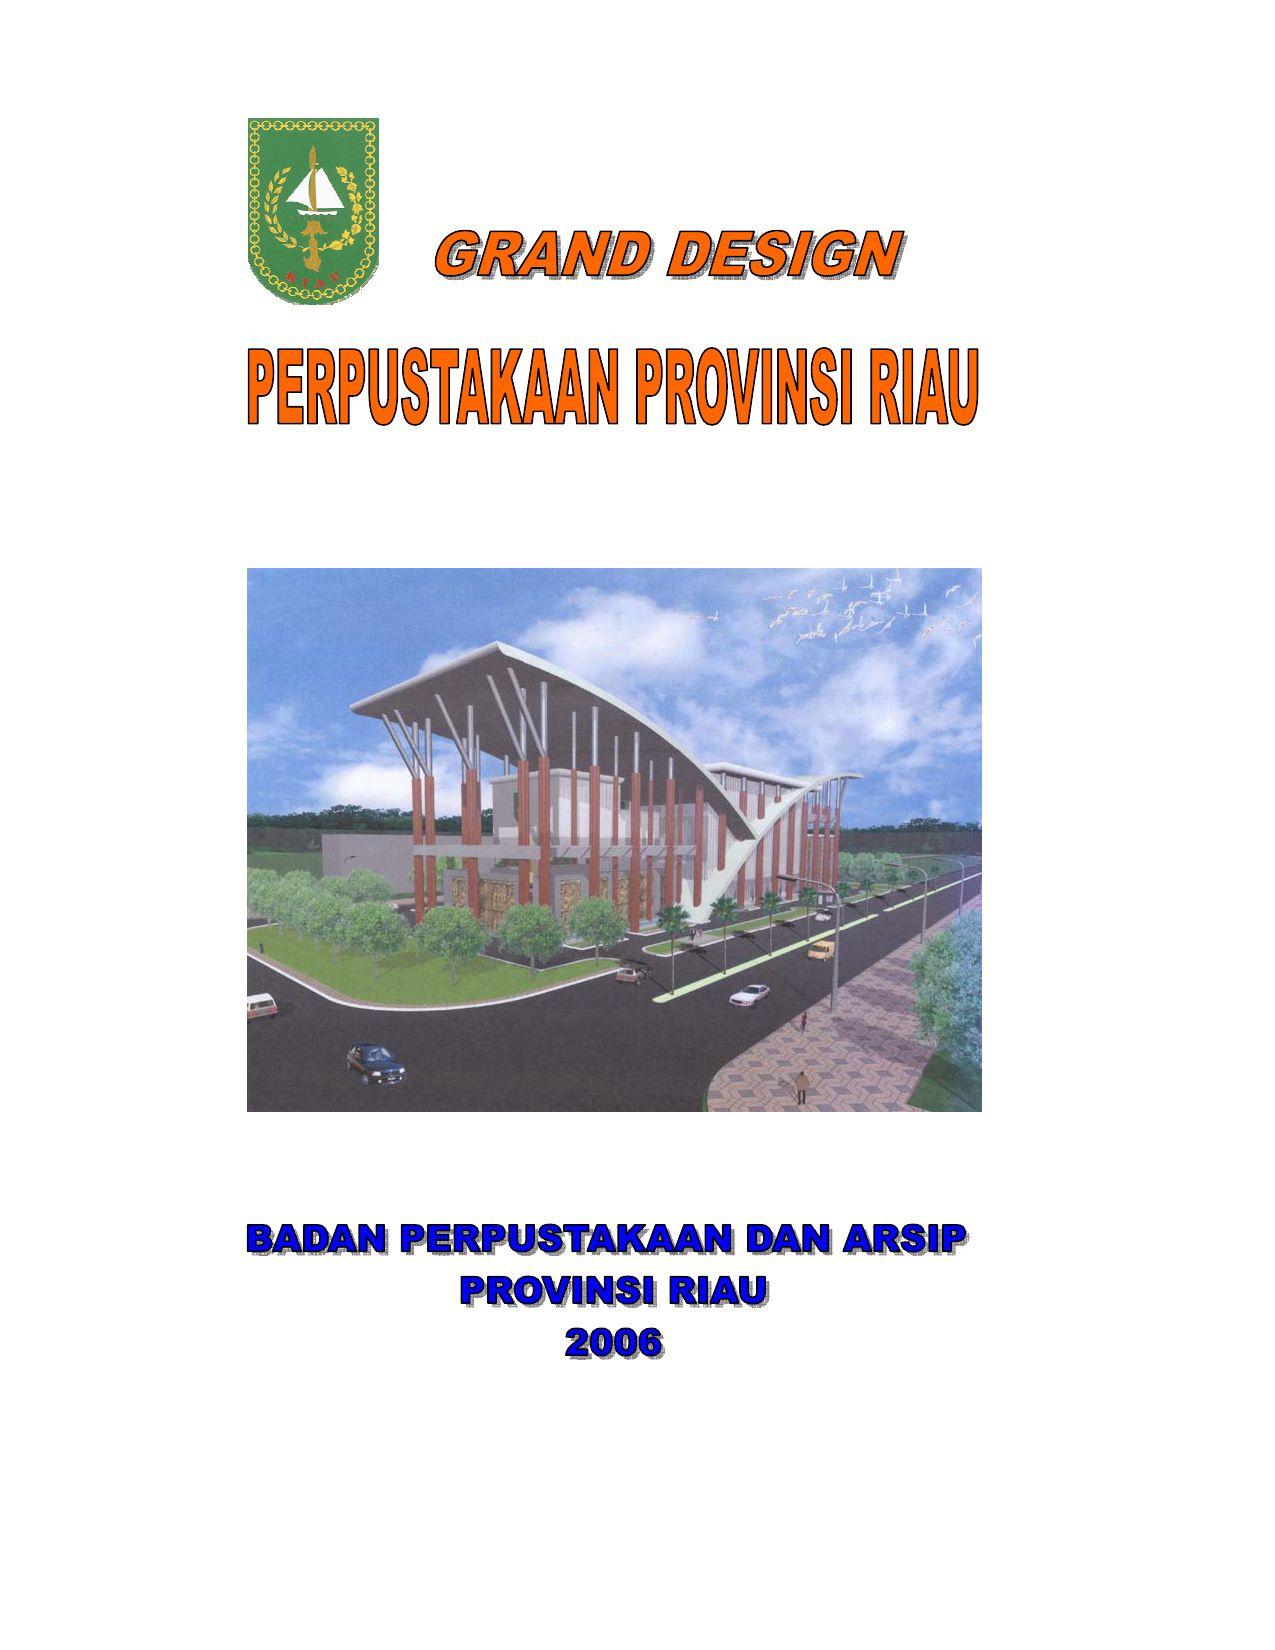 Grand design bpad provinsi riau by mustafa mustari issuu ccuart Choice Image